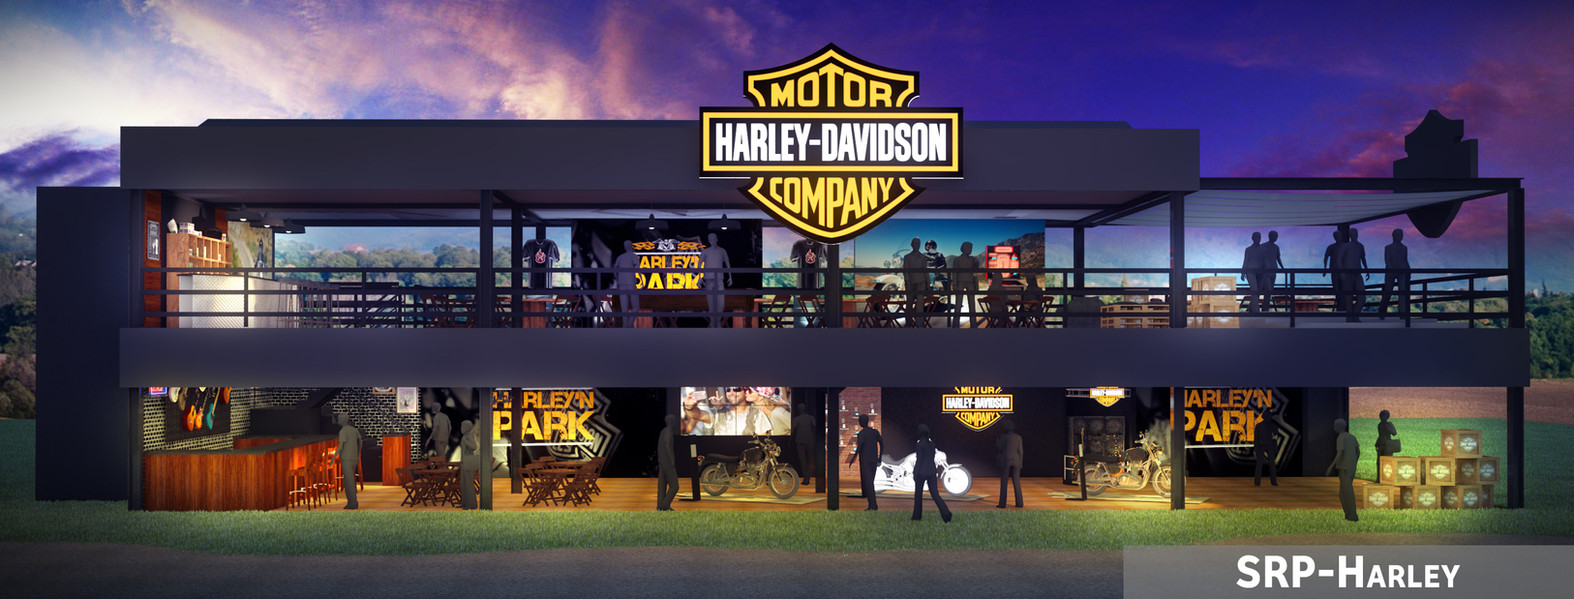 44SRP - Harley b.jpg